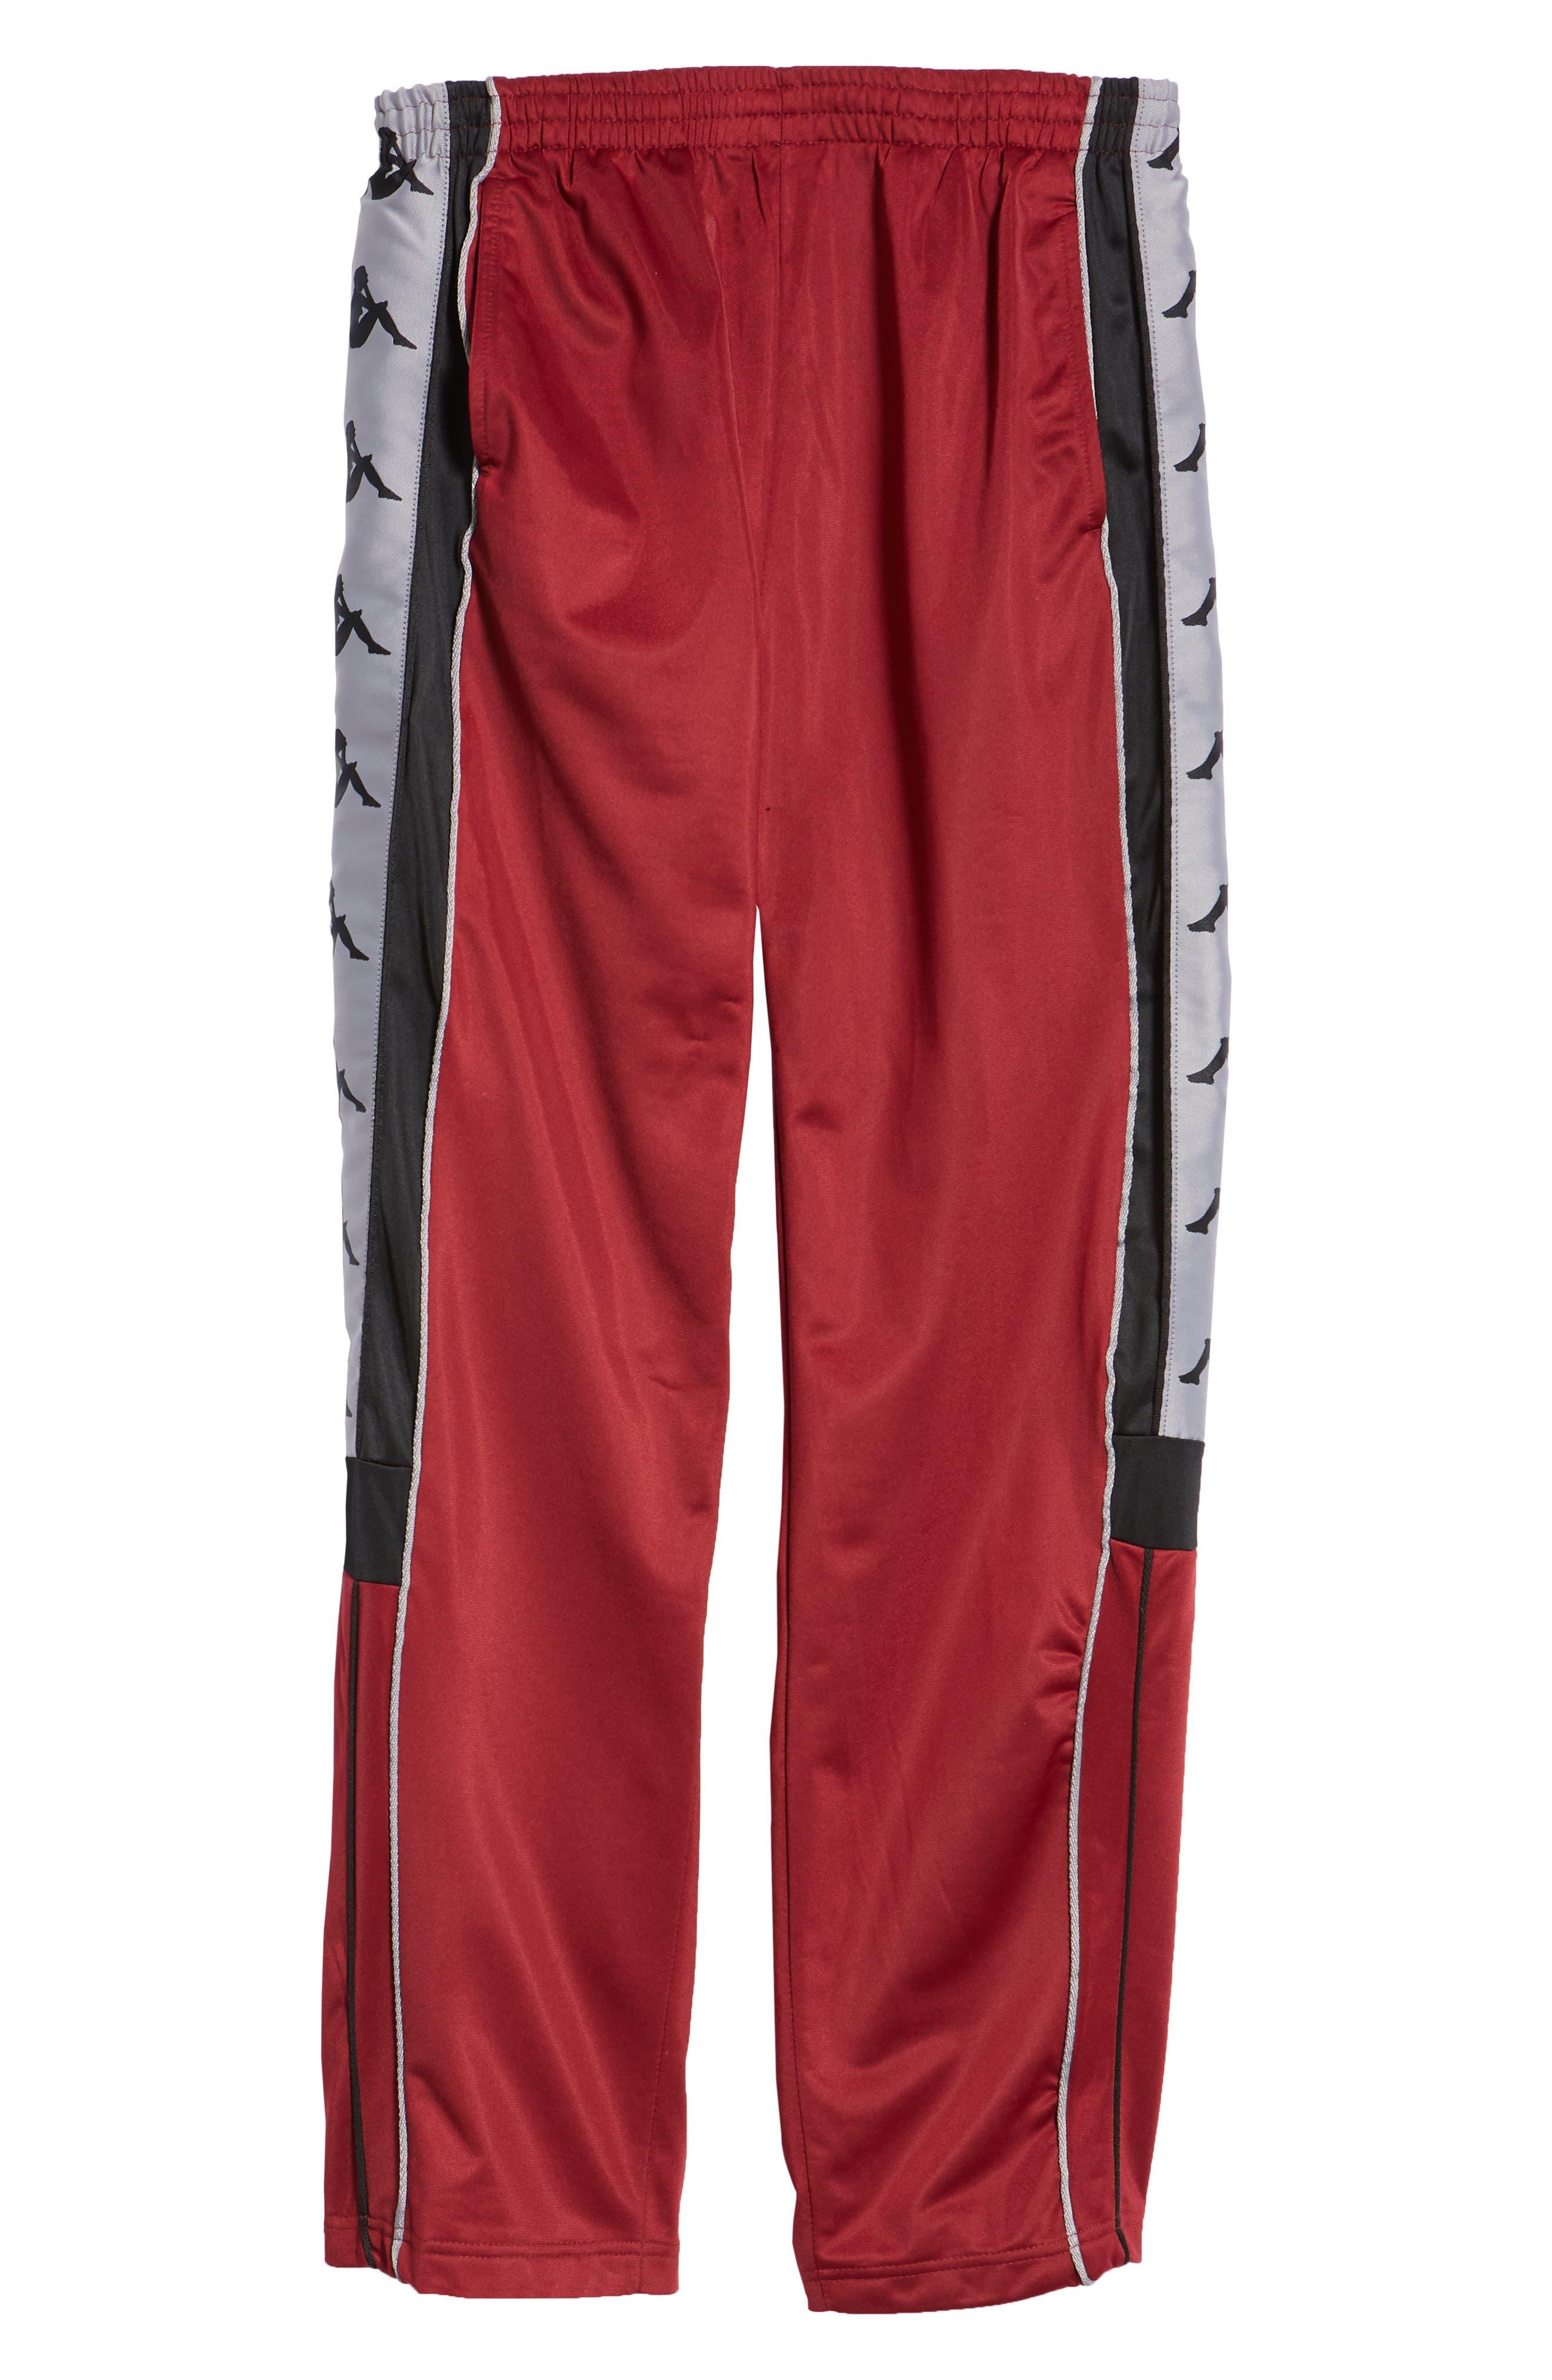 Active 222 Banda Snap-Away Warm-Up Pants,                             Alternate thumbnail 6, color,                             RED BORDEAUX BLACK